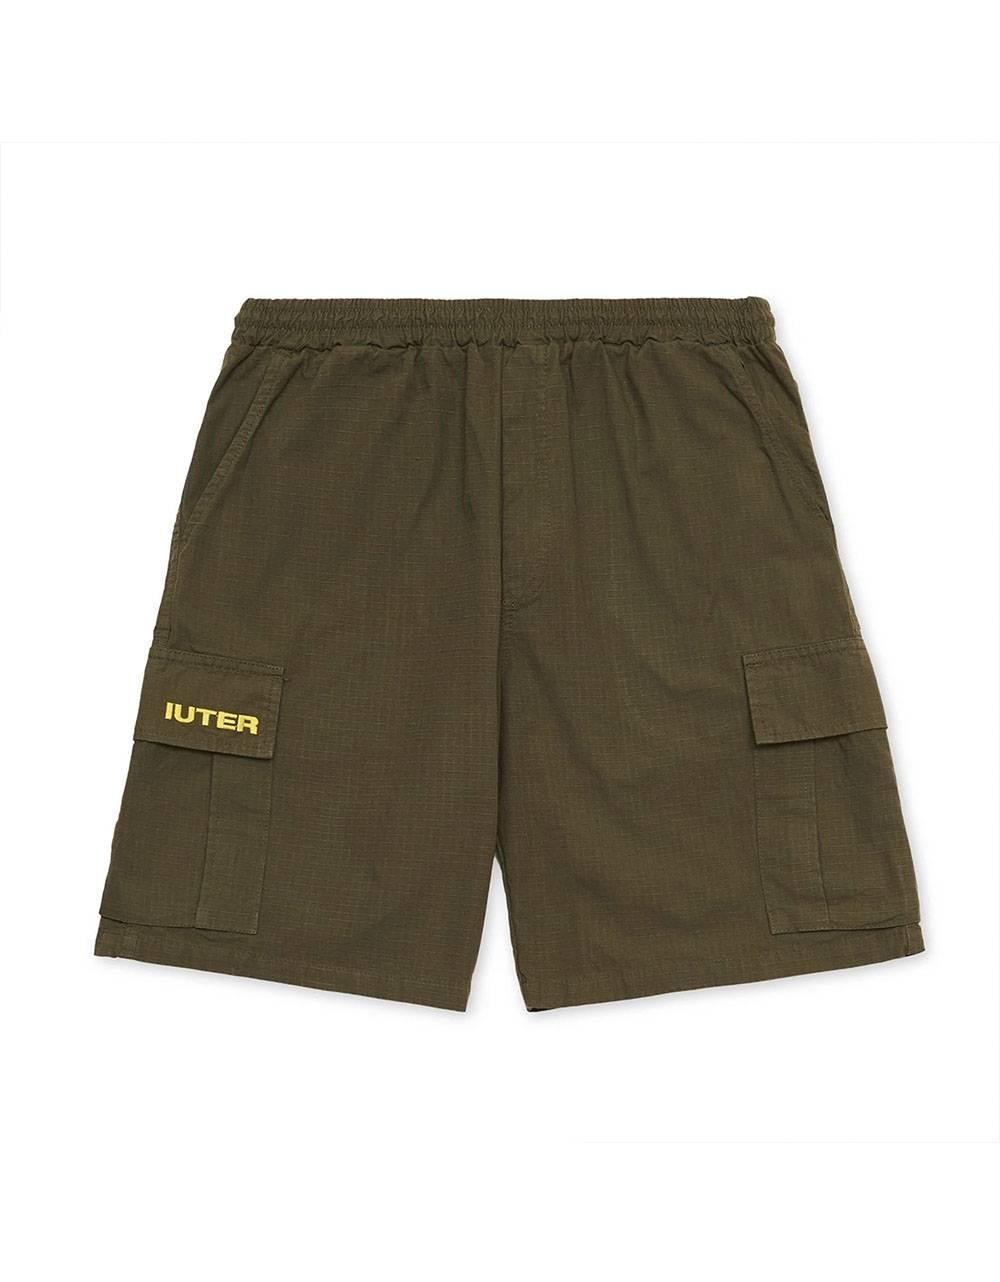 Iuter Ripstop Cargo shorts - army IUTER Shorts 99,00€